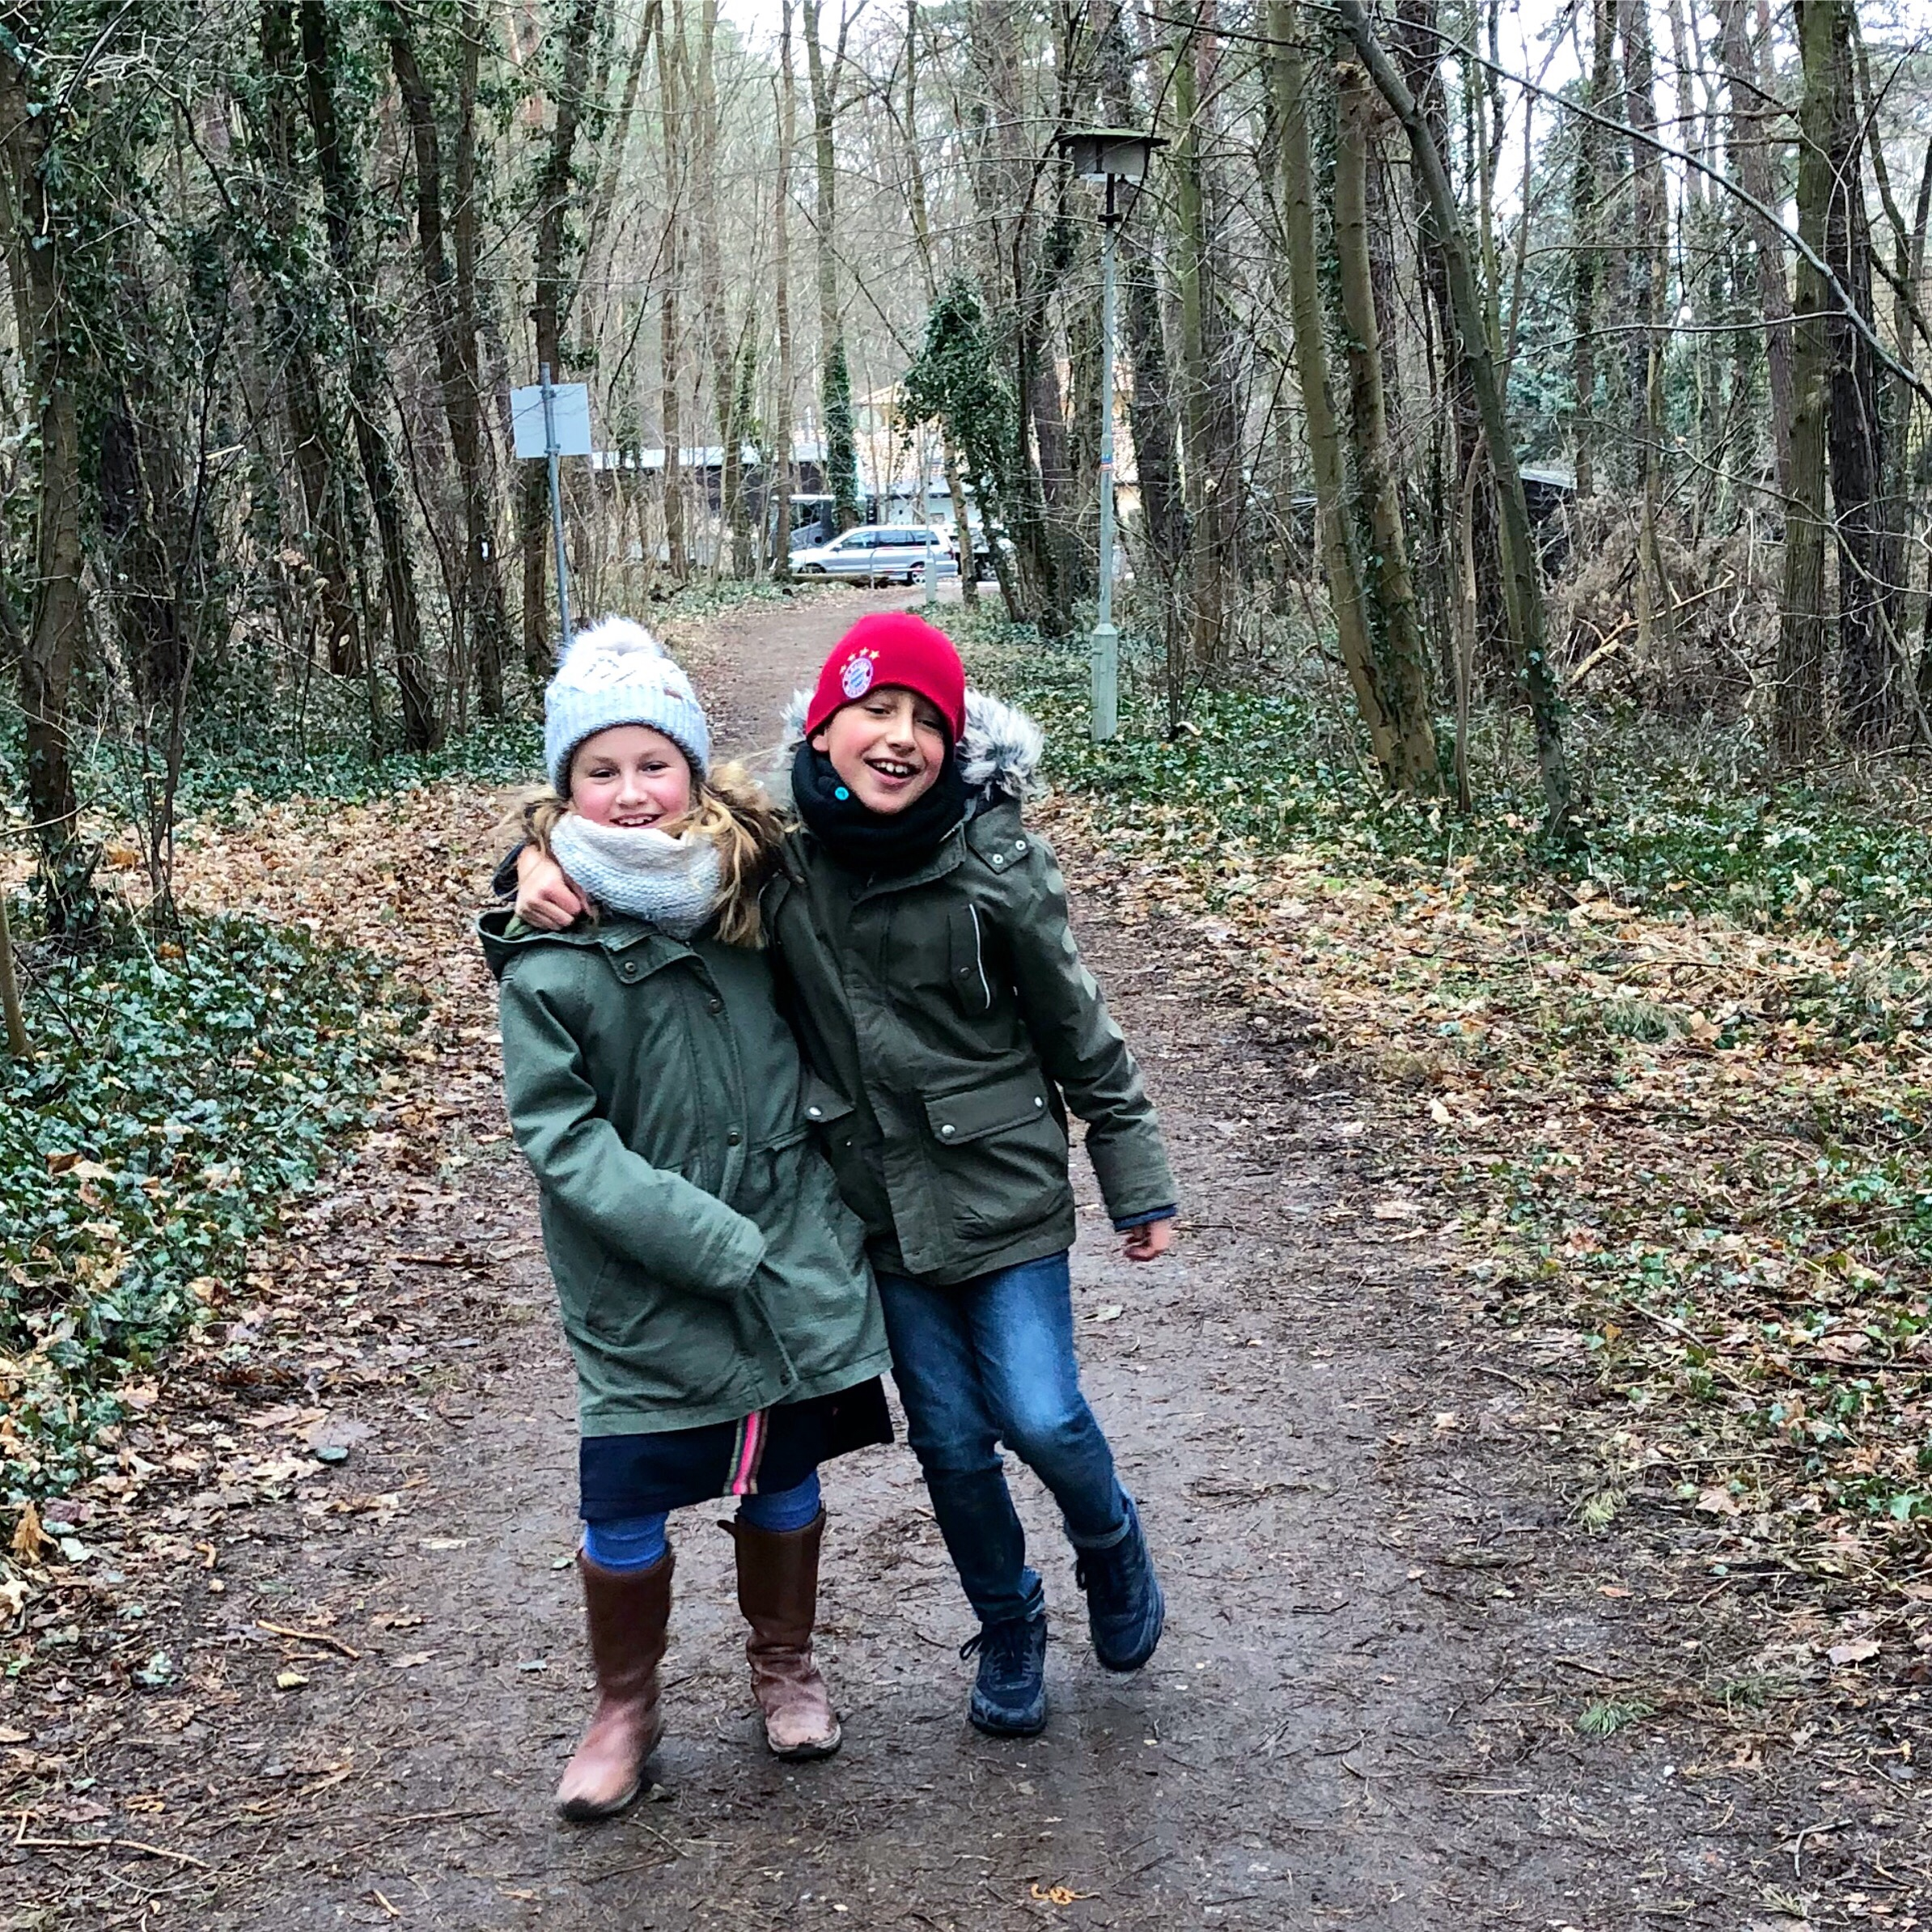 Geschwister beim Osterspaziergang | berlinmittemom.com